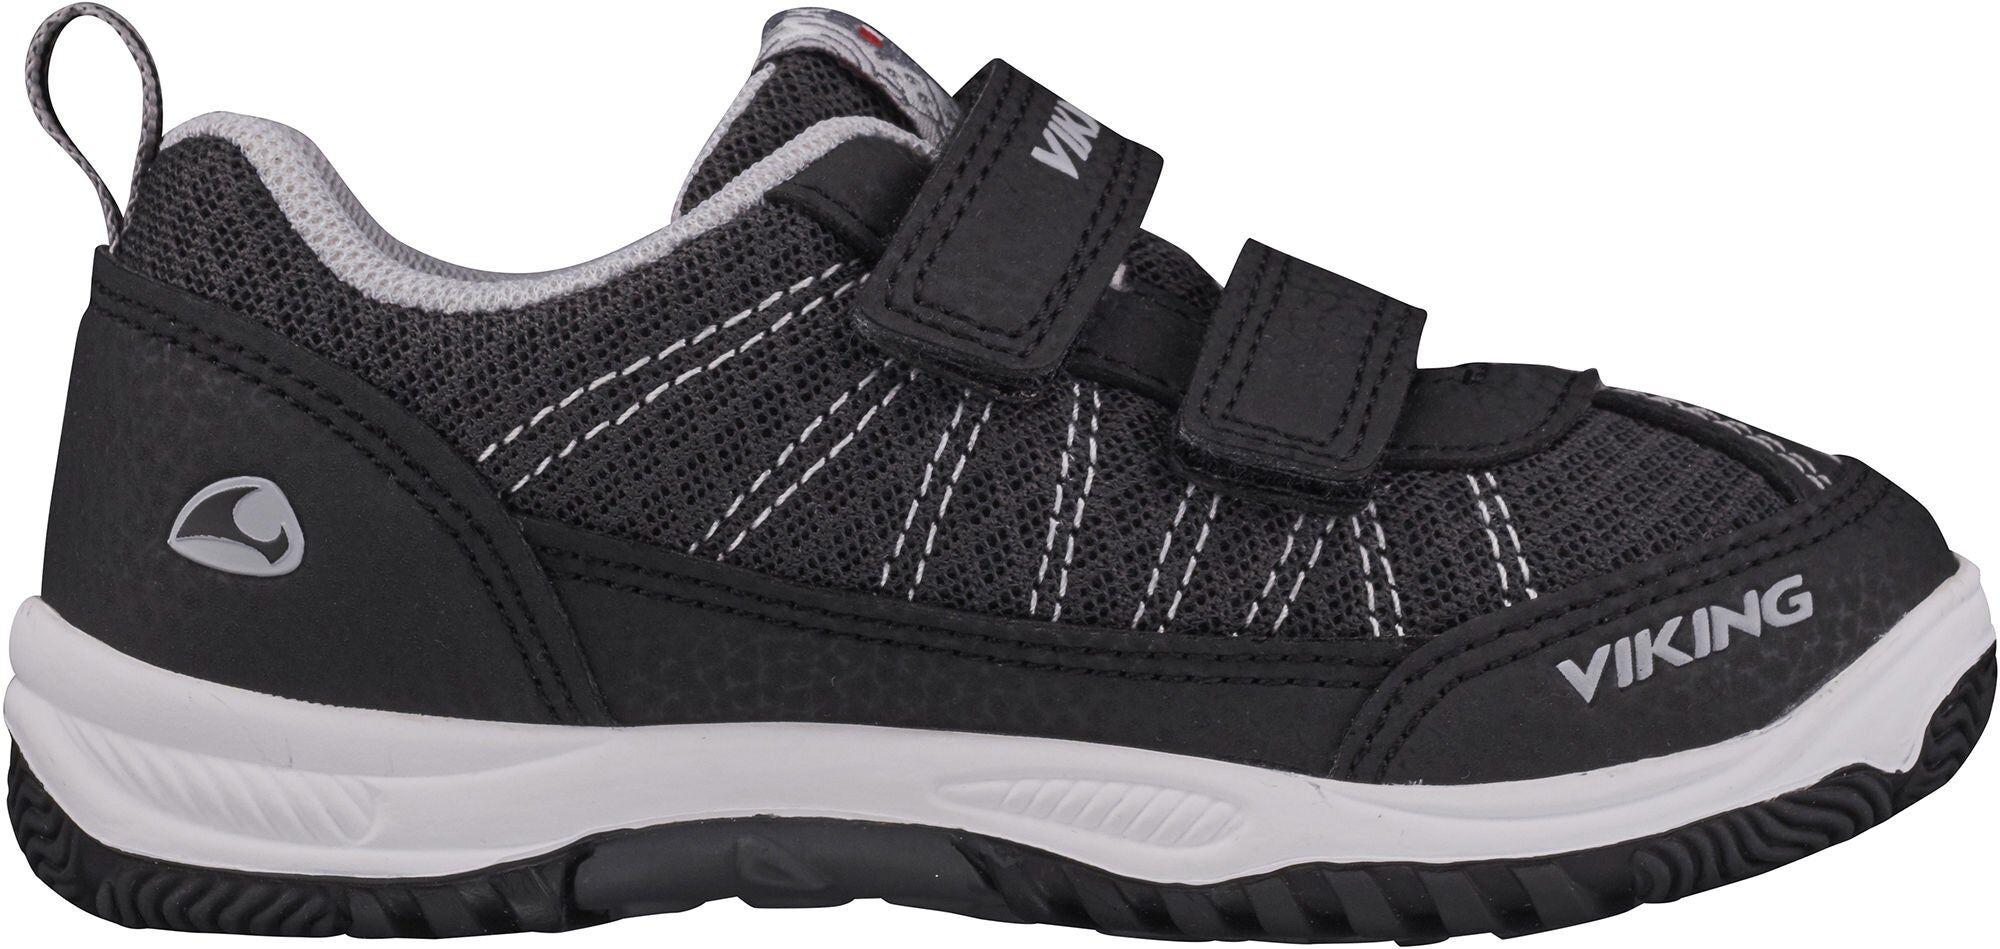 Viking Bryne Sneaker, Black/Grey 22